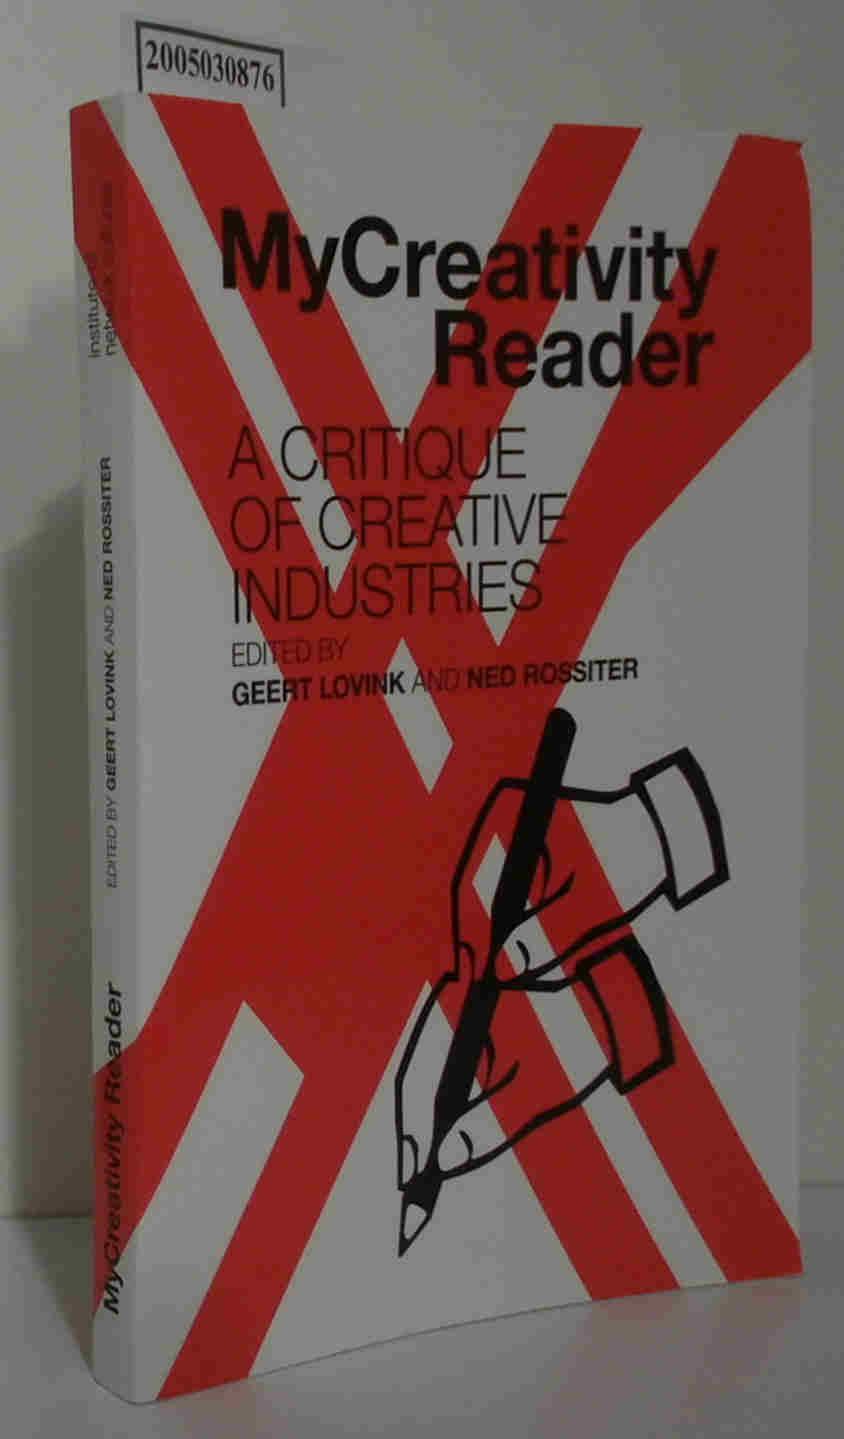 My Creativity Reader A Critique of Creative Industries